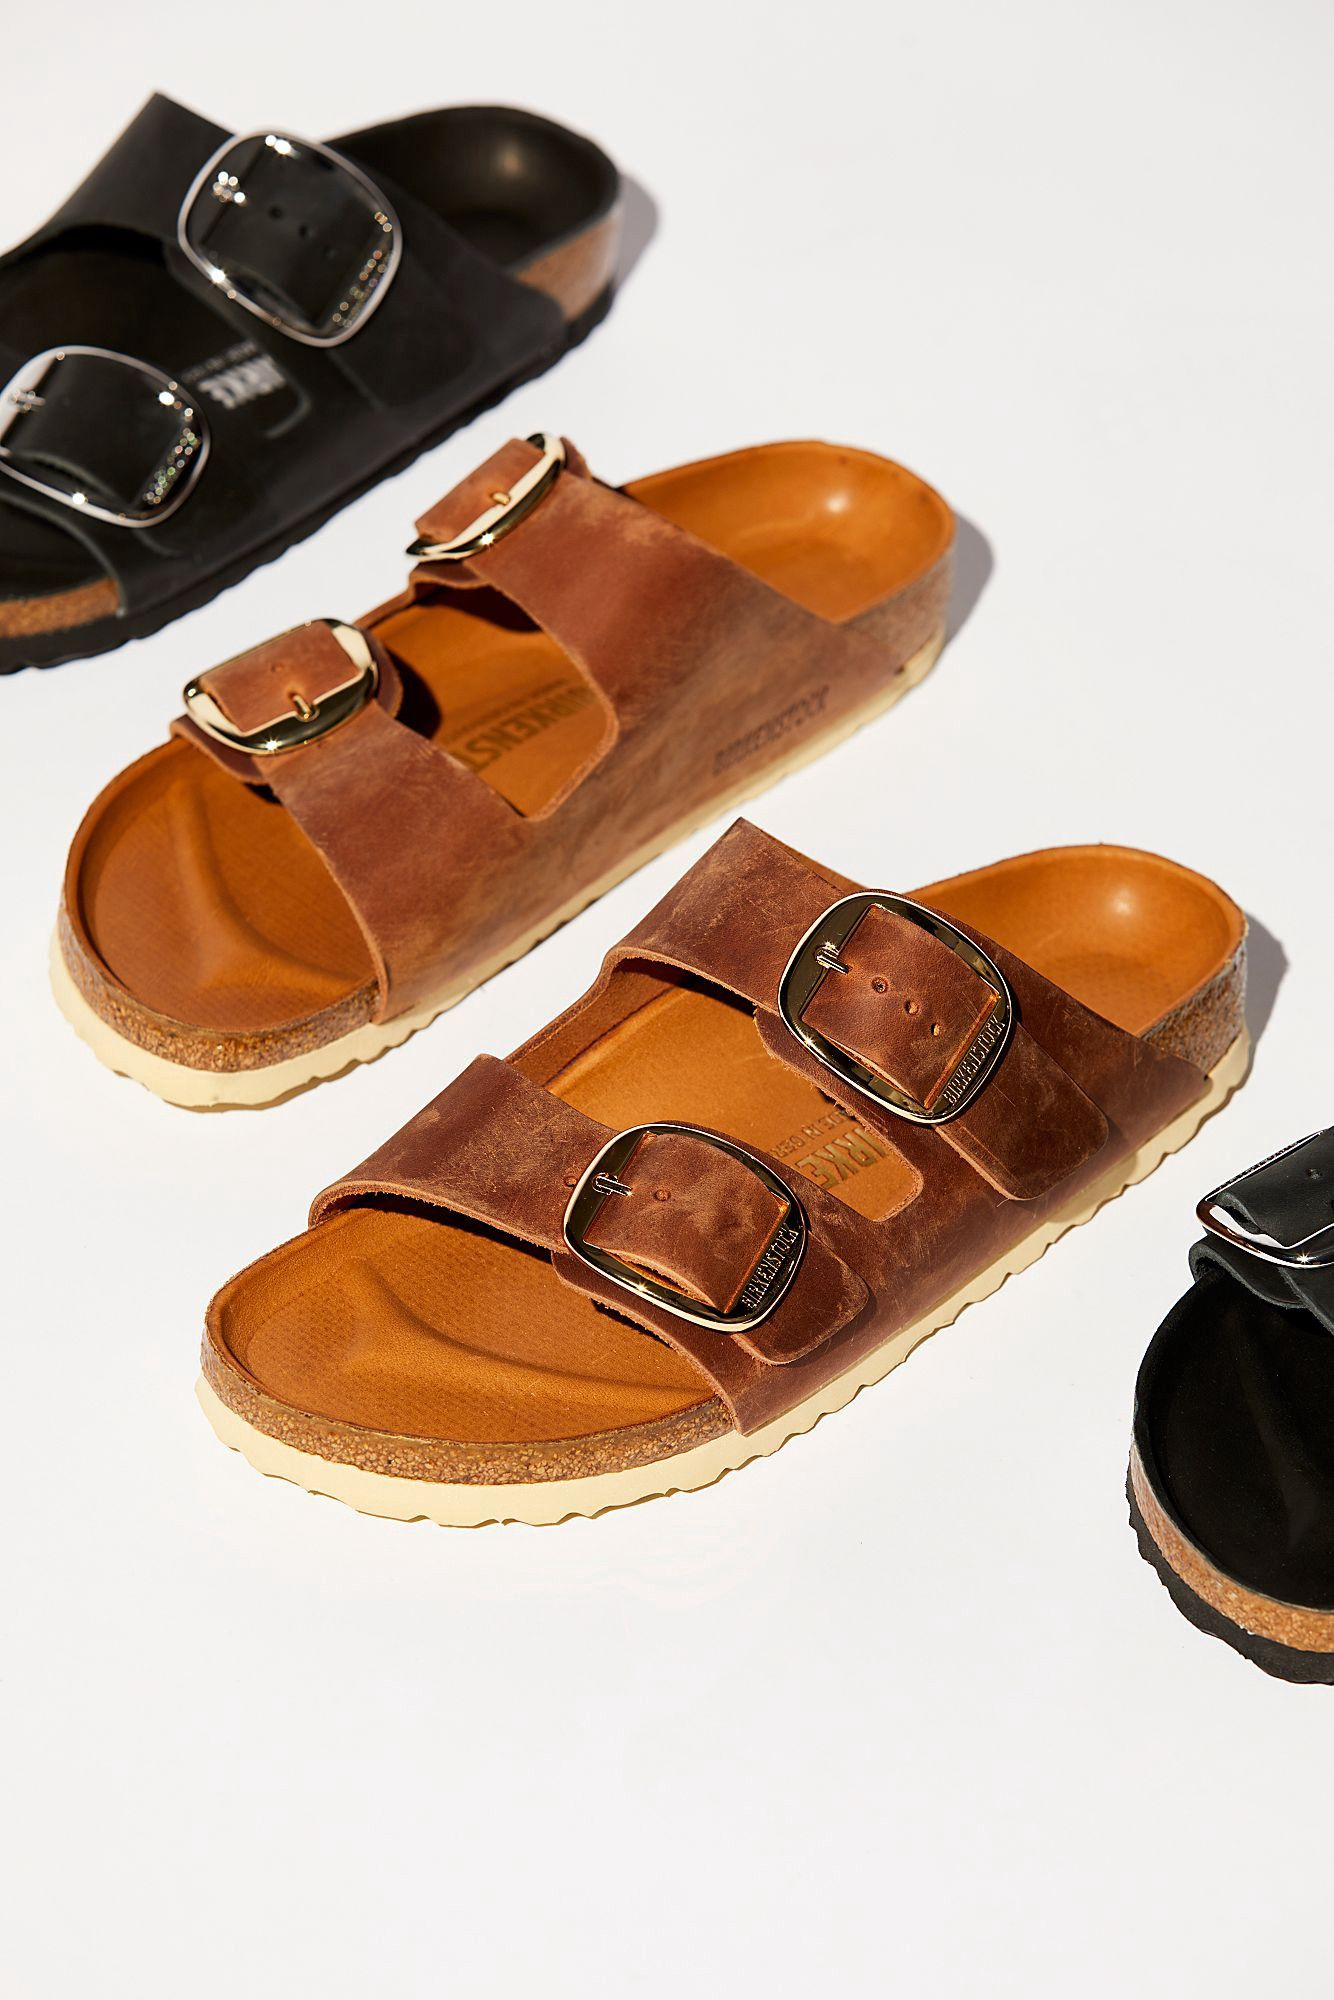 Free People Arizona Hex Birkenstock Sandal 37 Euro